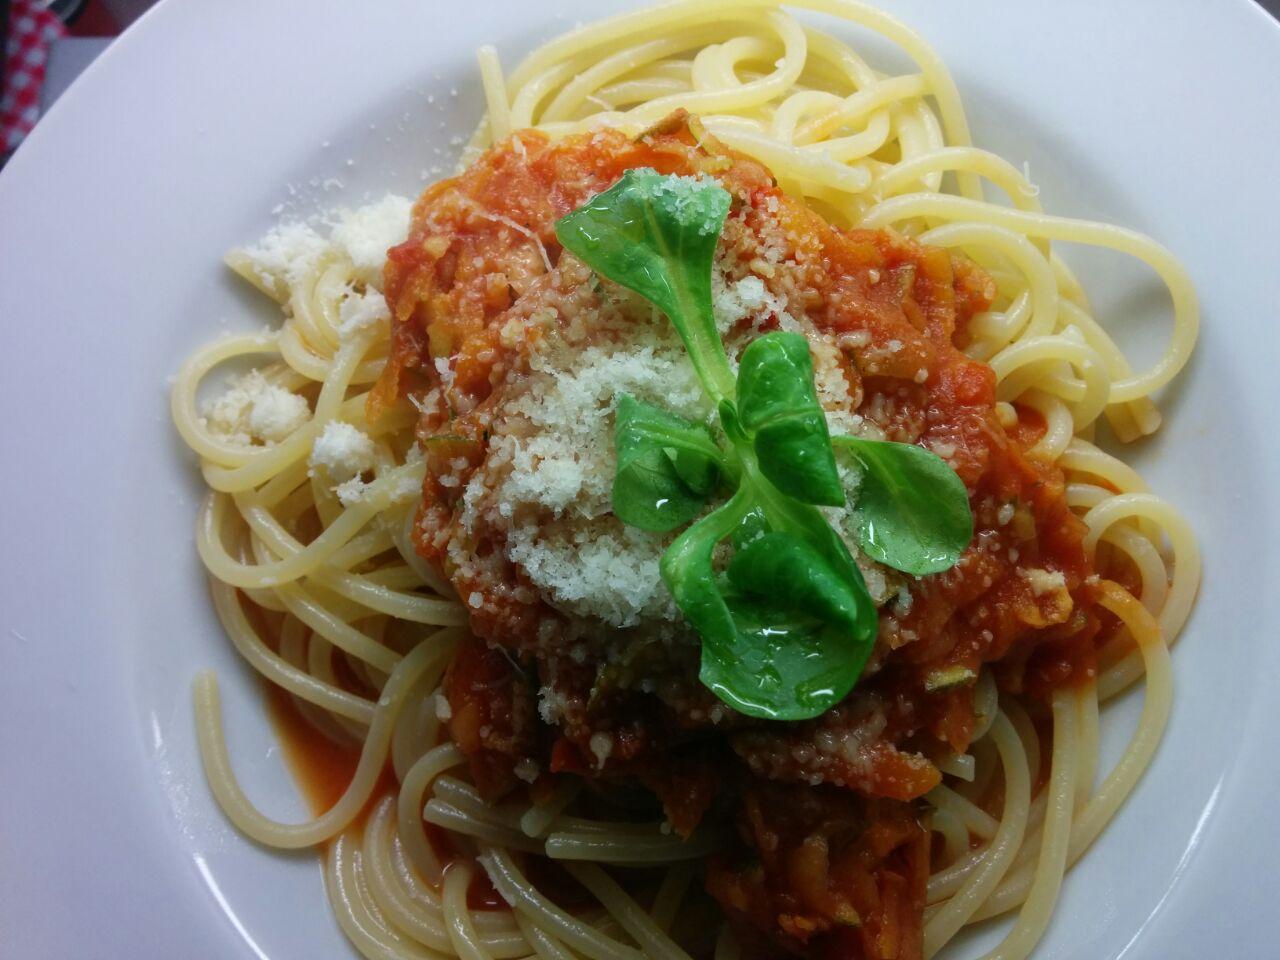 Karotten-Zucchini-Spaghetti